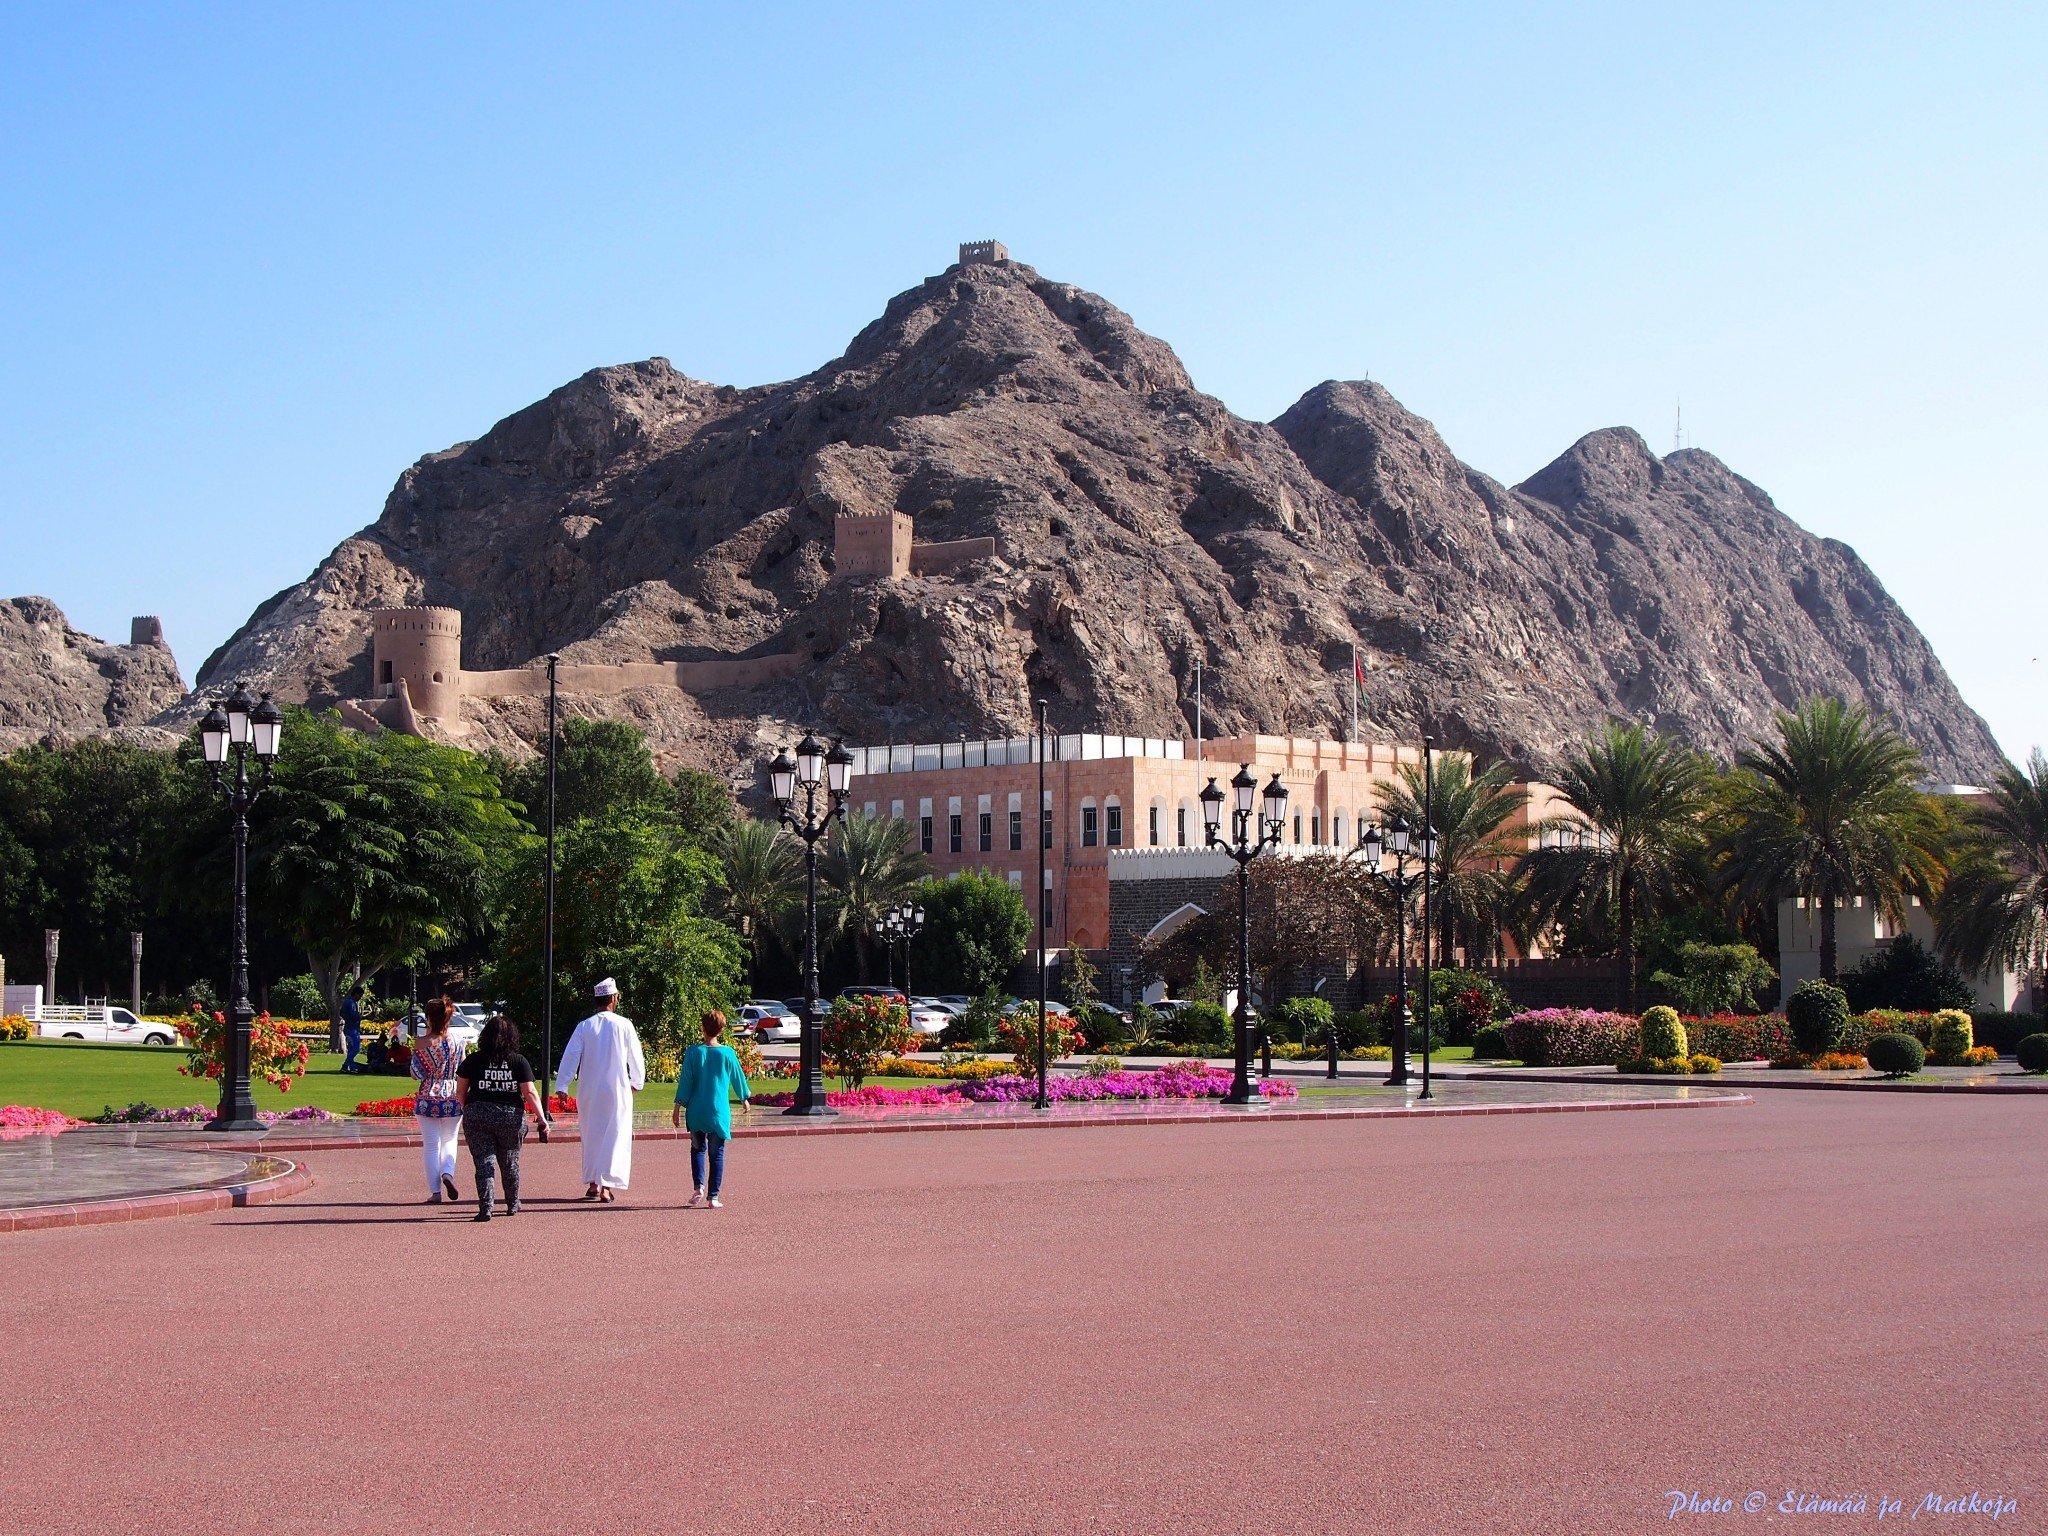 Oman Masqat Al Alam 3 Photo © Elämää ja Matkoja